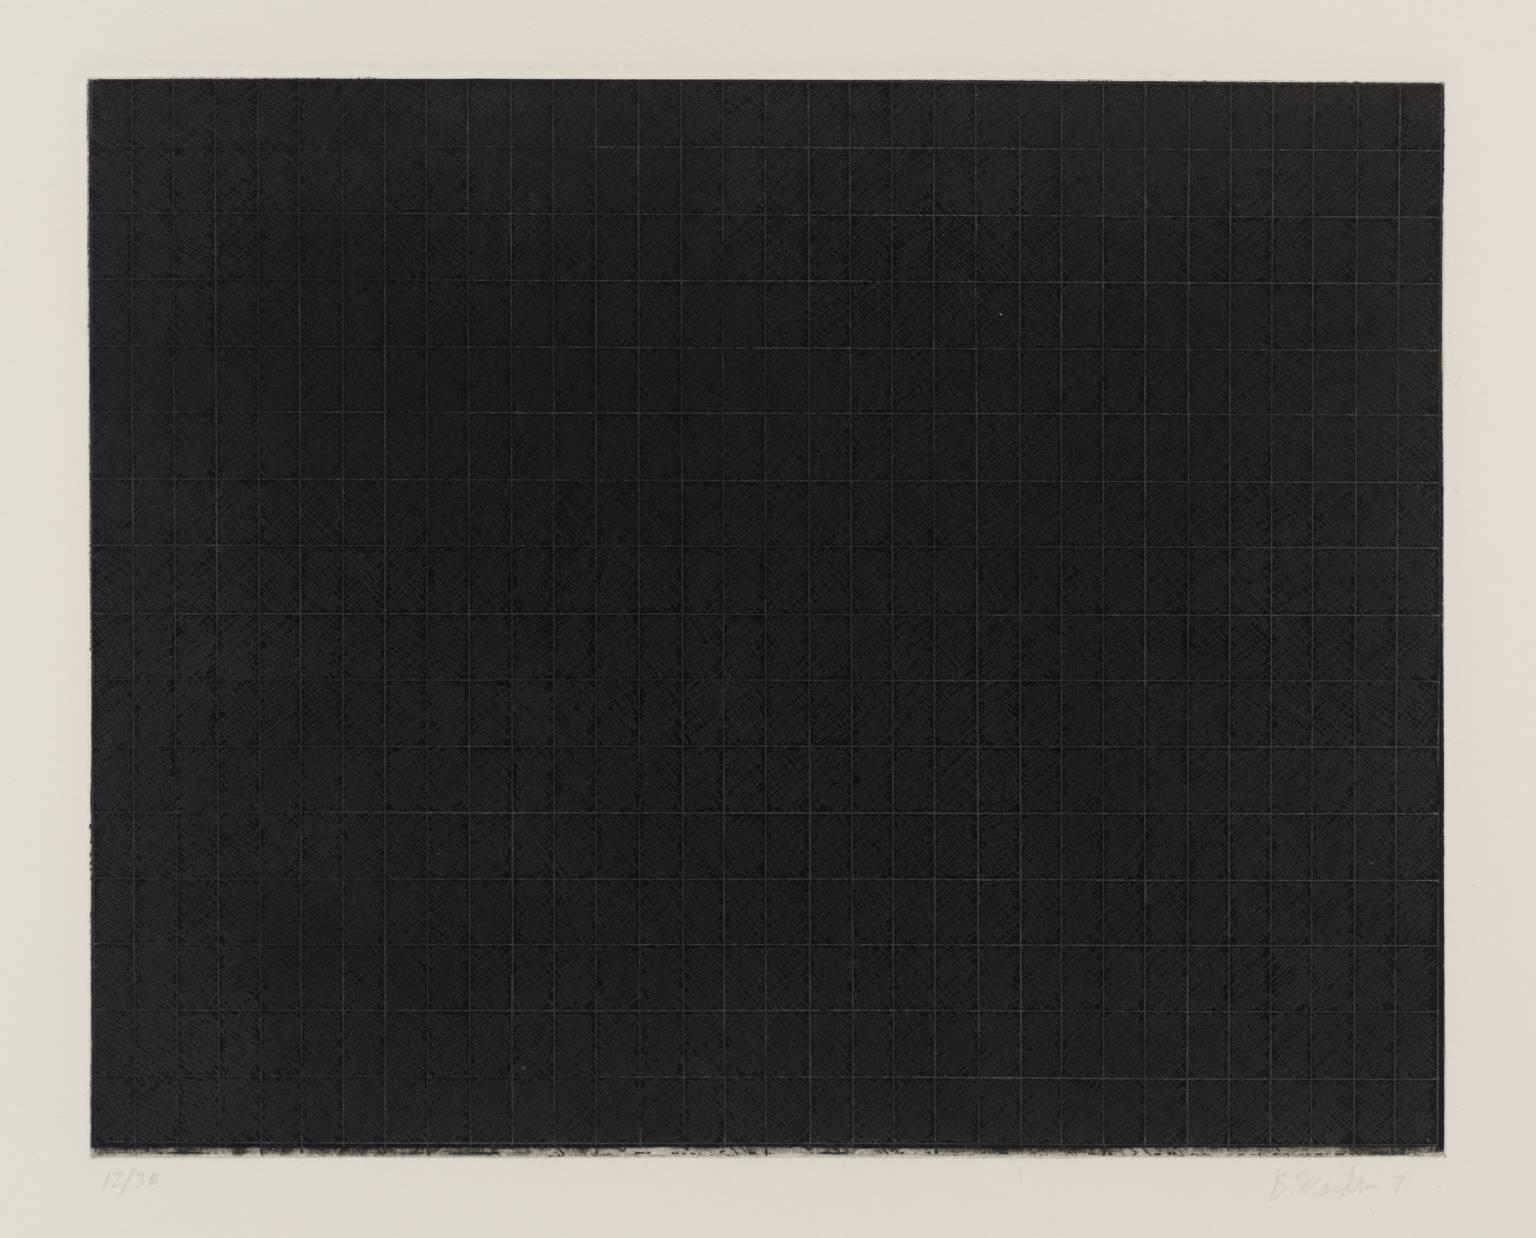 [no title] 1971 by Brice Marden born 1938